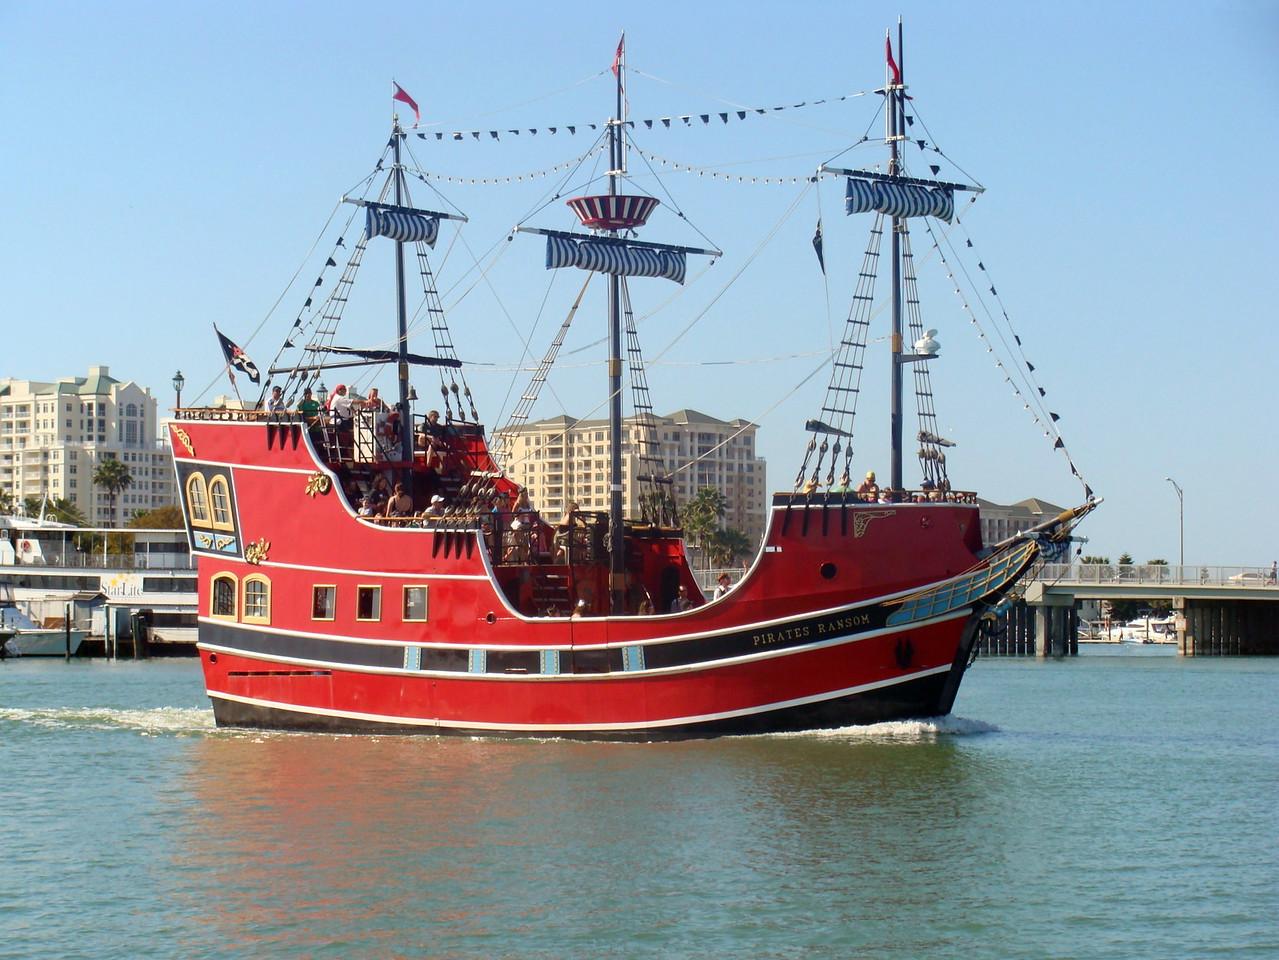 Captain Memo's Pirate Ship